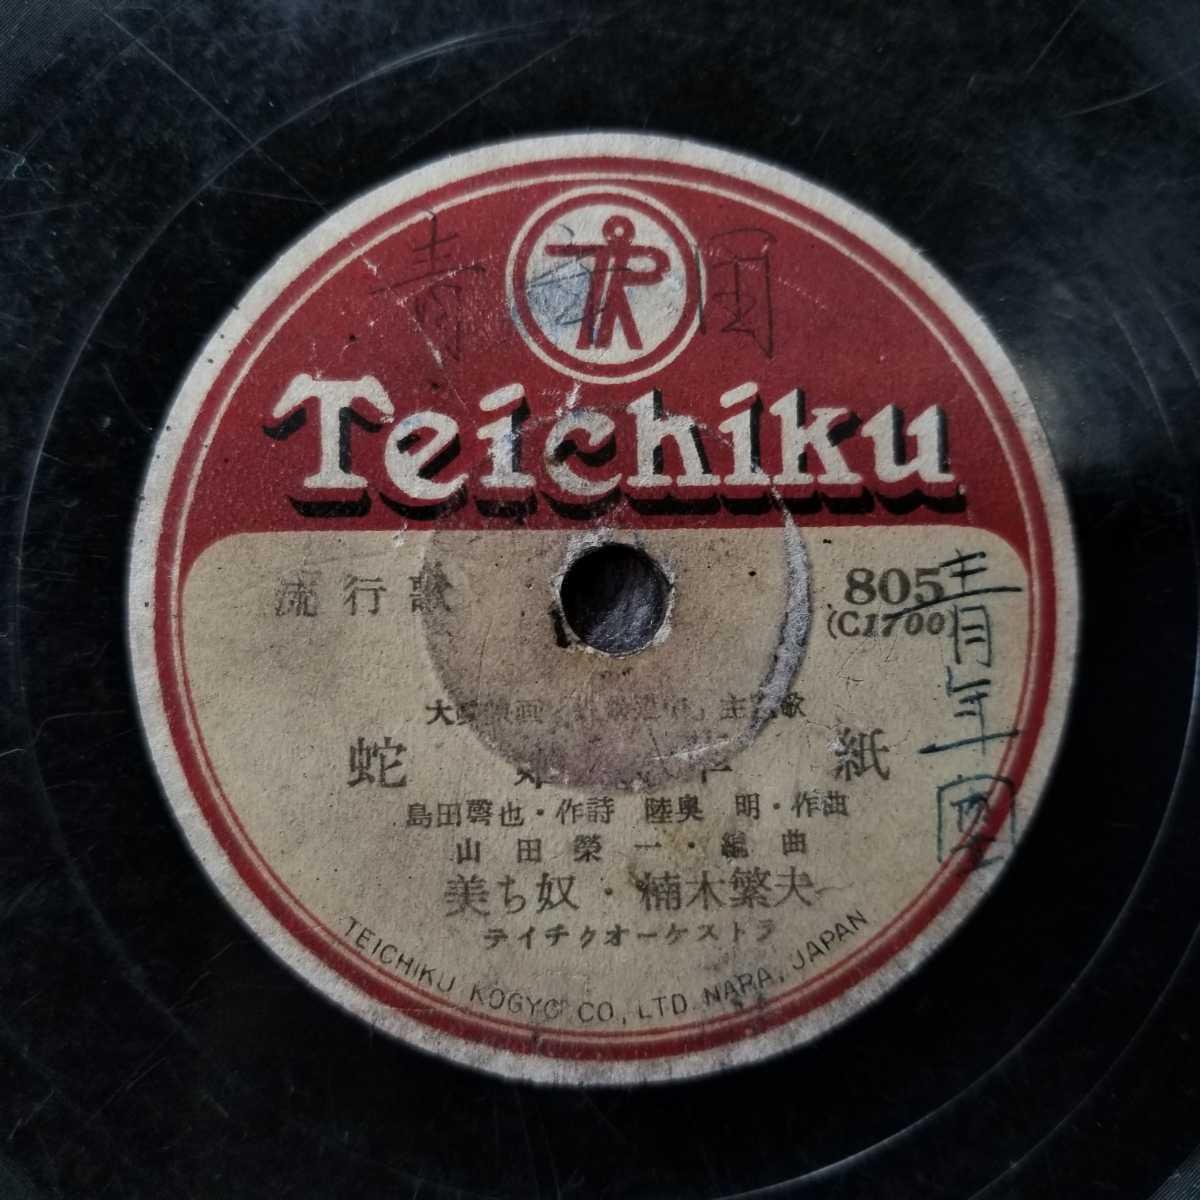 流行歌 映画主題歌 蛇姫道中 楠木繁夫 他不明 蓄音機SPレコード盤10インチ(25cm) (39_画像4